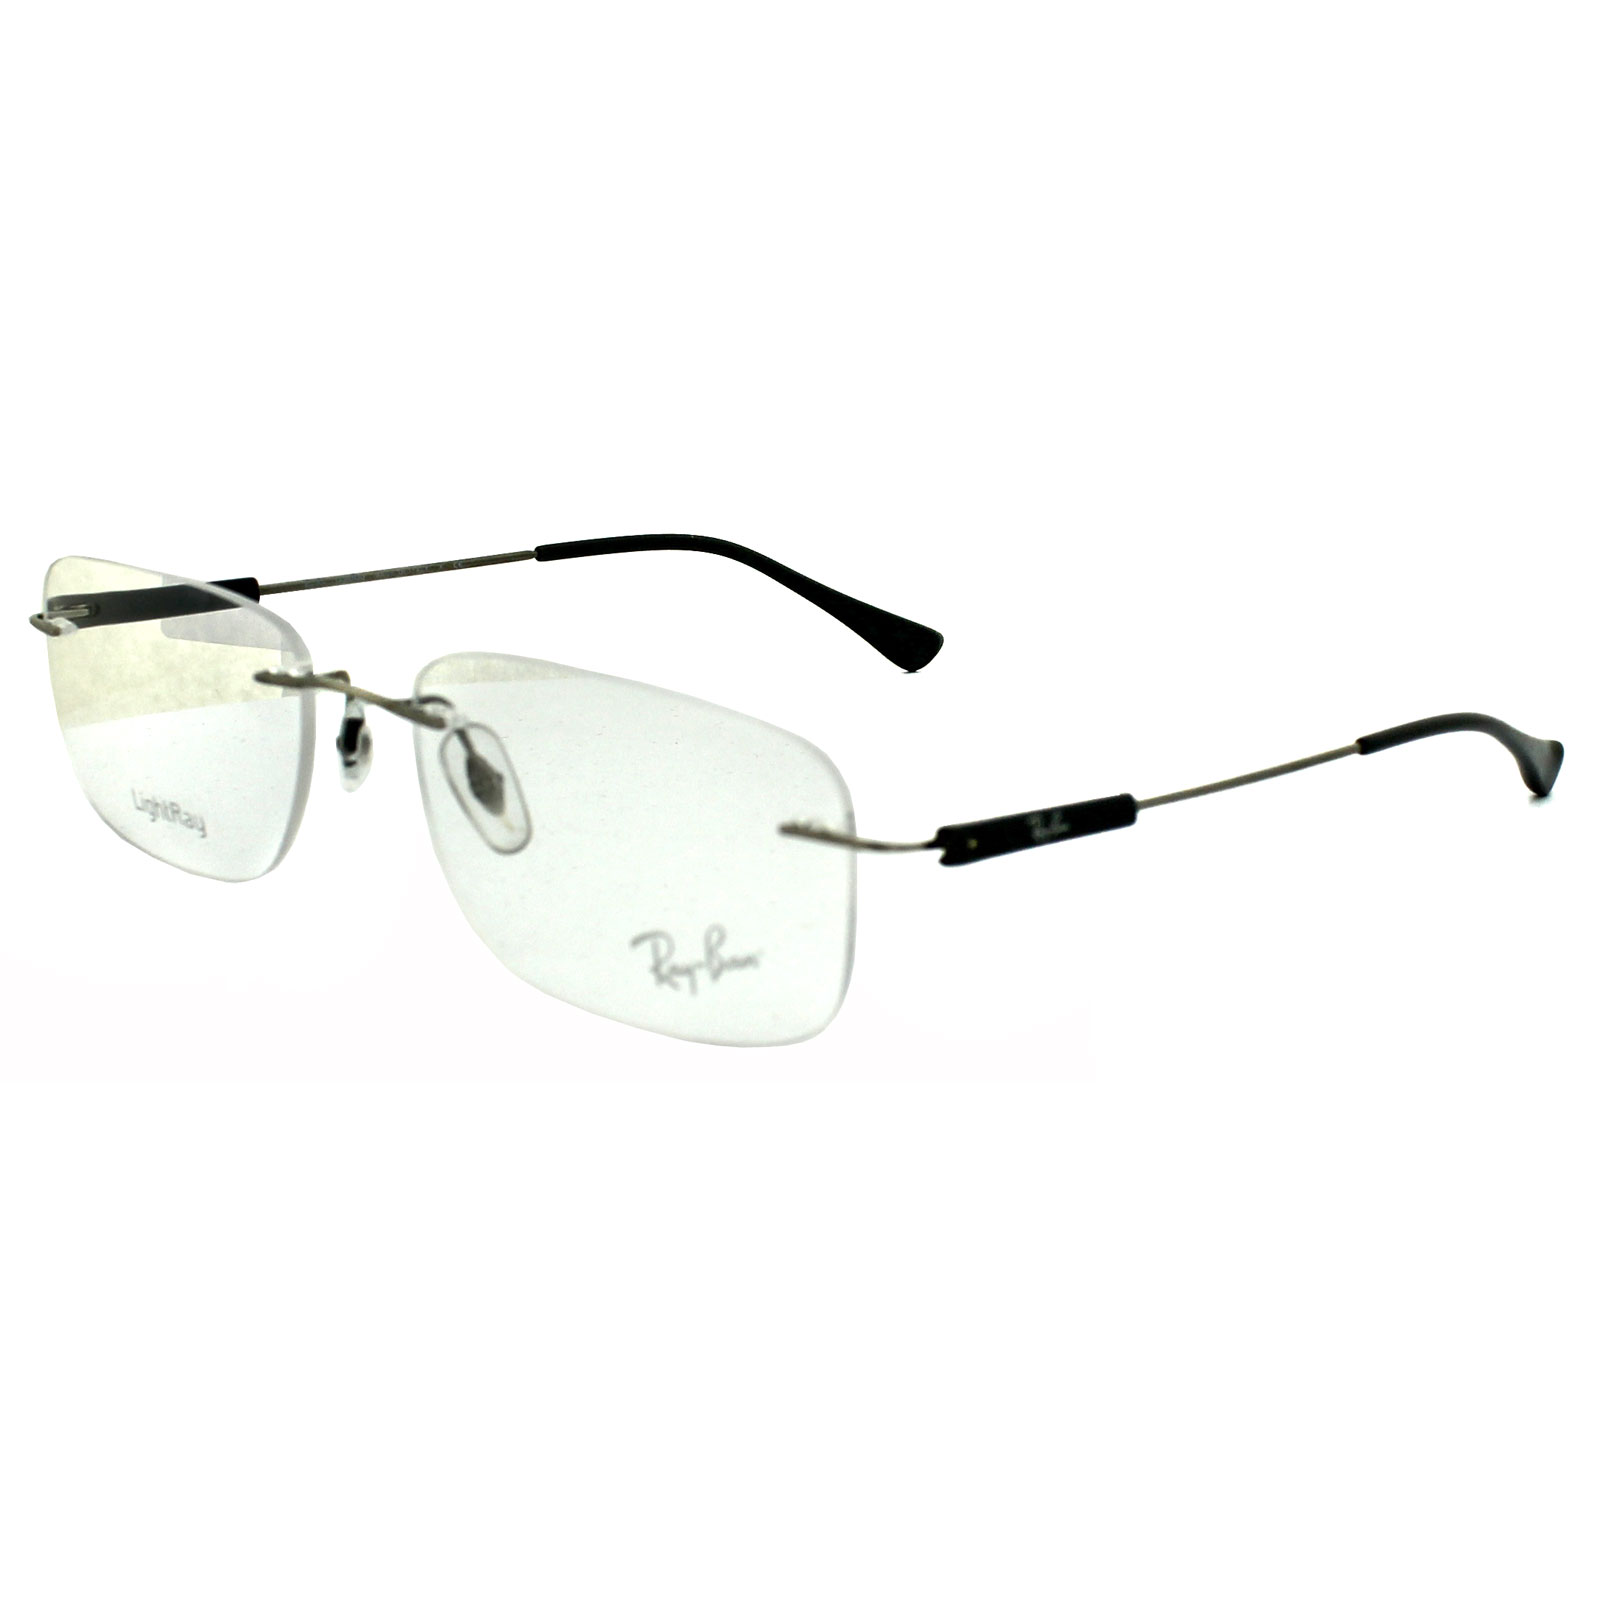 Ray Ban Silver Frame Glasses : Ray-Ban Glasses Frames 8712 1127 Silver Grey eBay